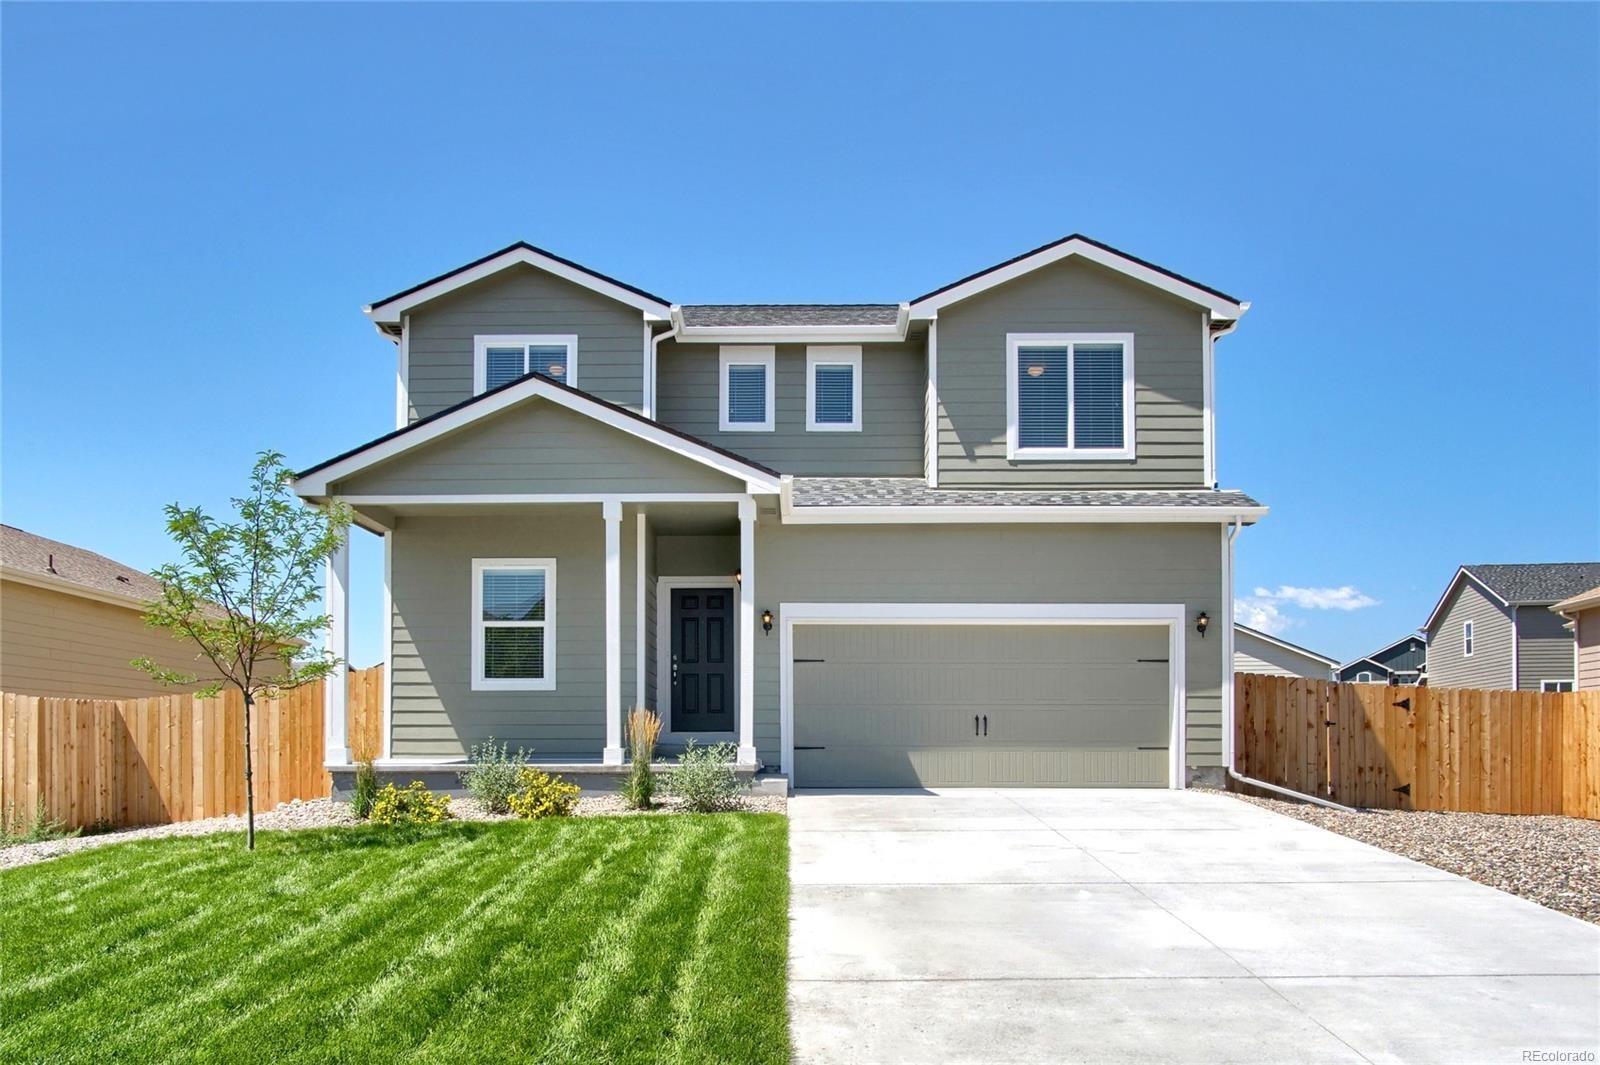 MLS# 8392455 - 1 - 221 Mesa Avenue, Lochbuie, CO 80603